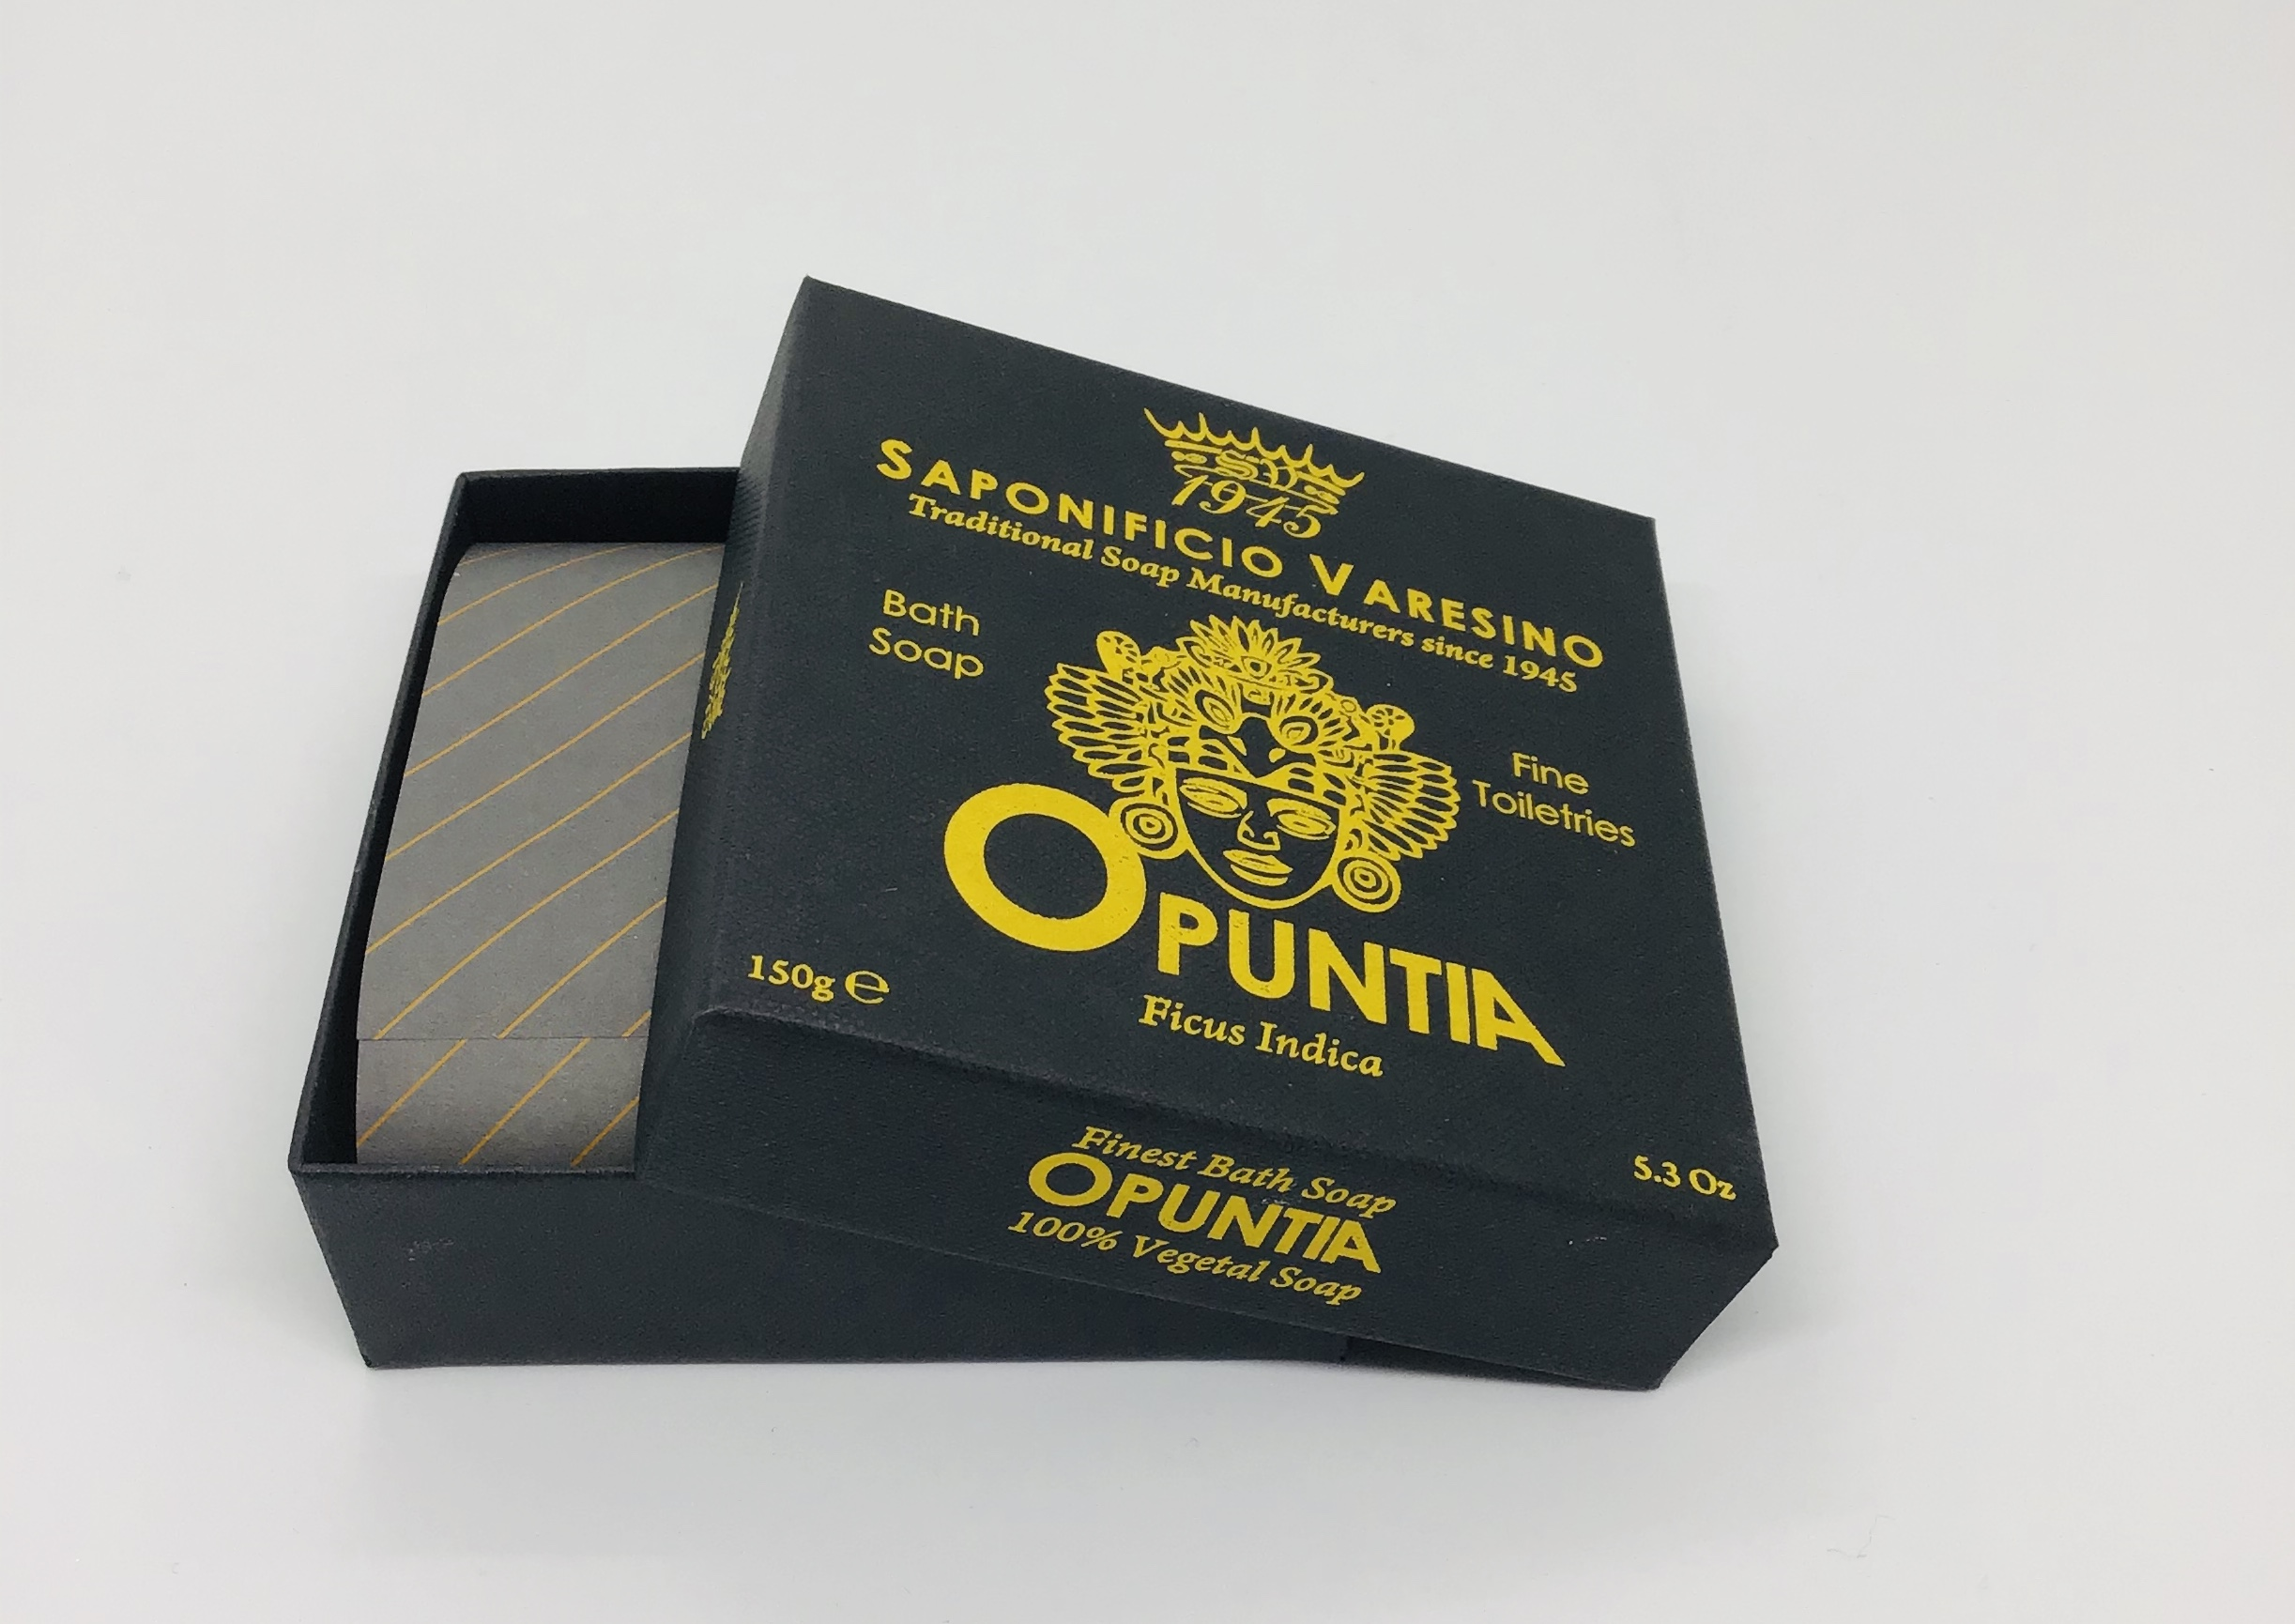 Dolomiti /opuntia bath soap